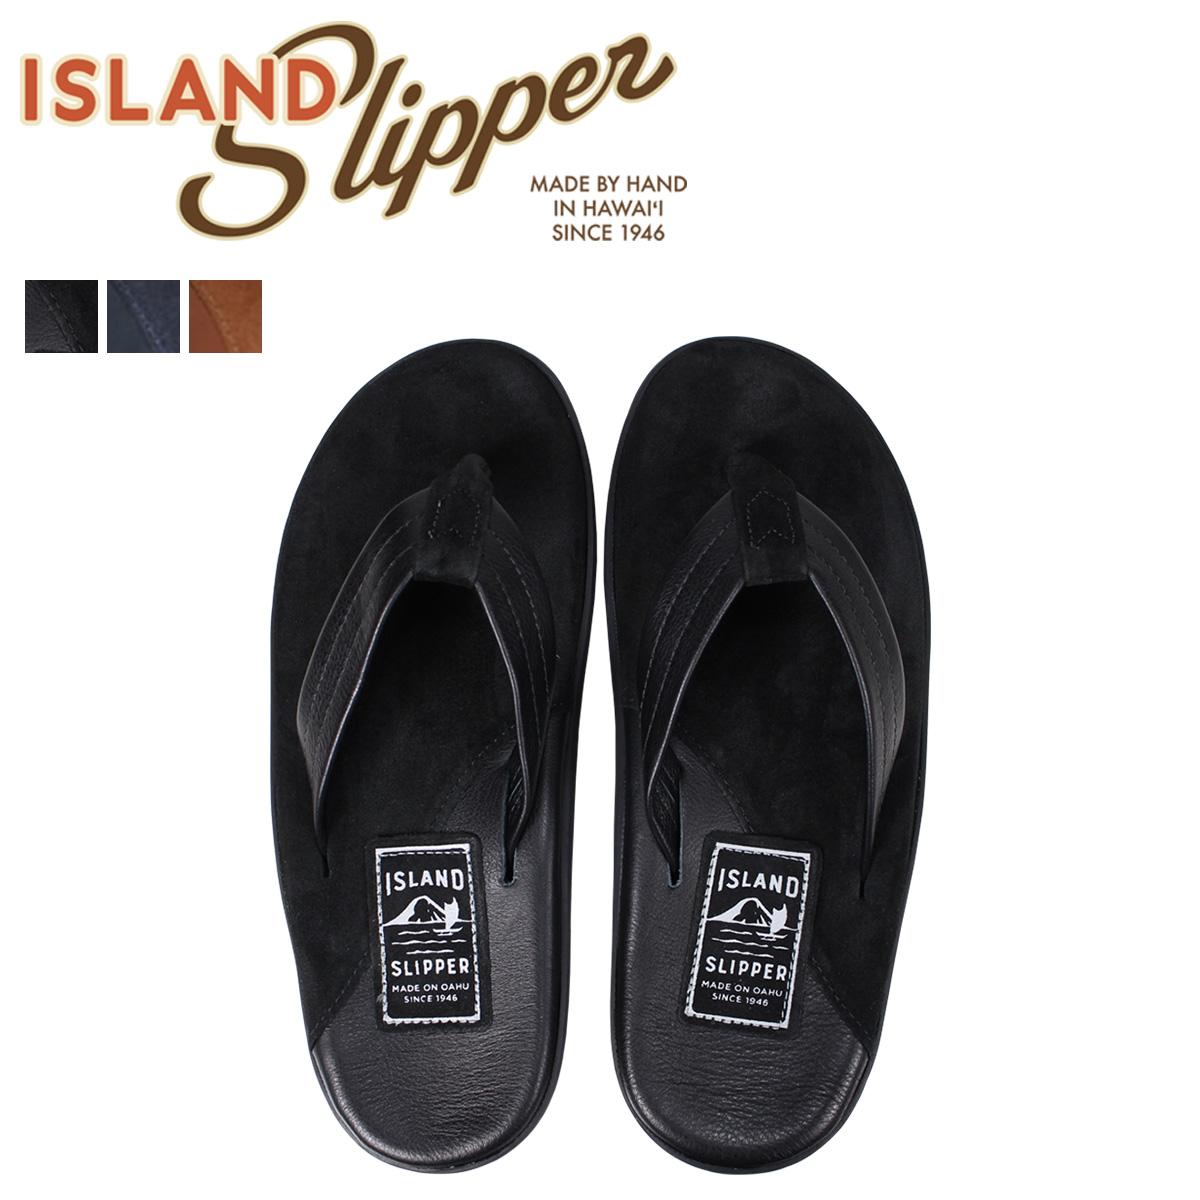 ISLAND SLIPPER LEATHER SUEDE アイランドスリッパ サンダル トングサンダル メンズ スエード レザー PB205 PT205 [4/5 追加入荷]